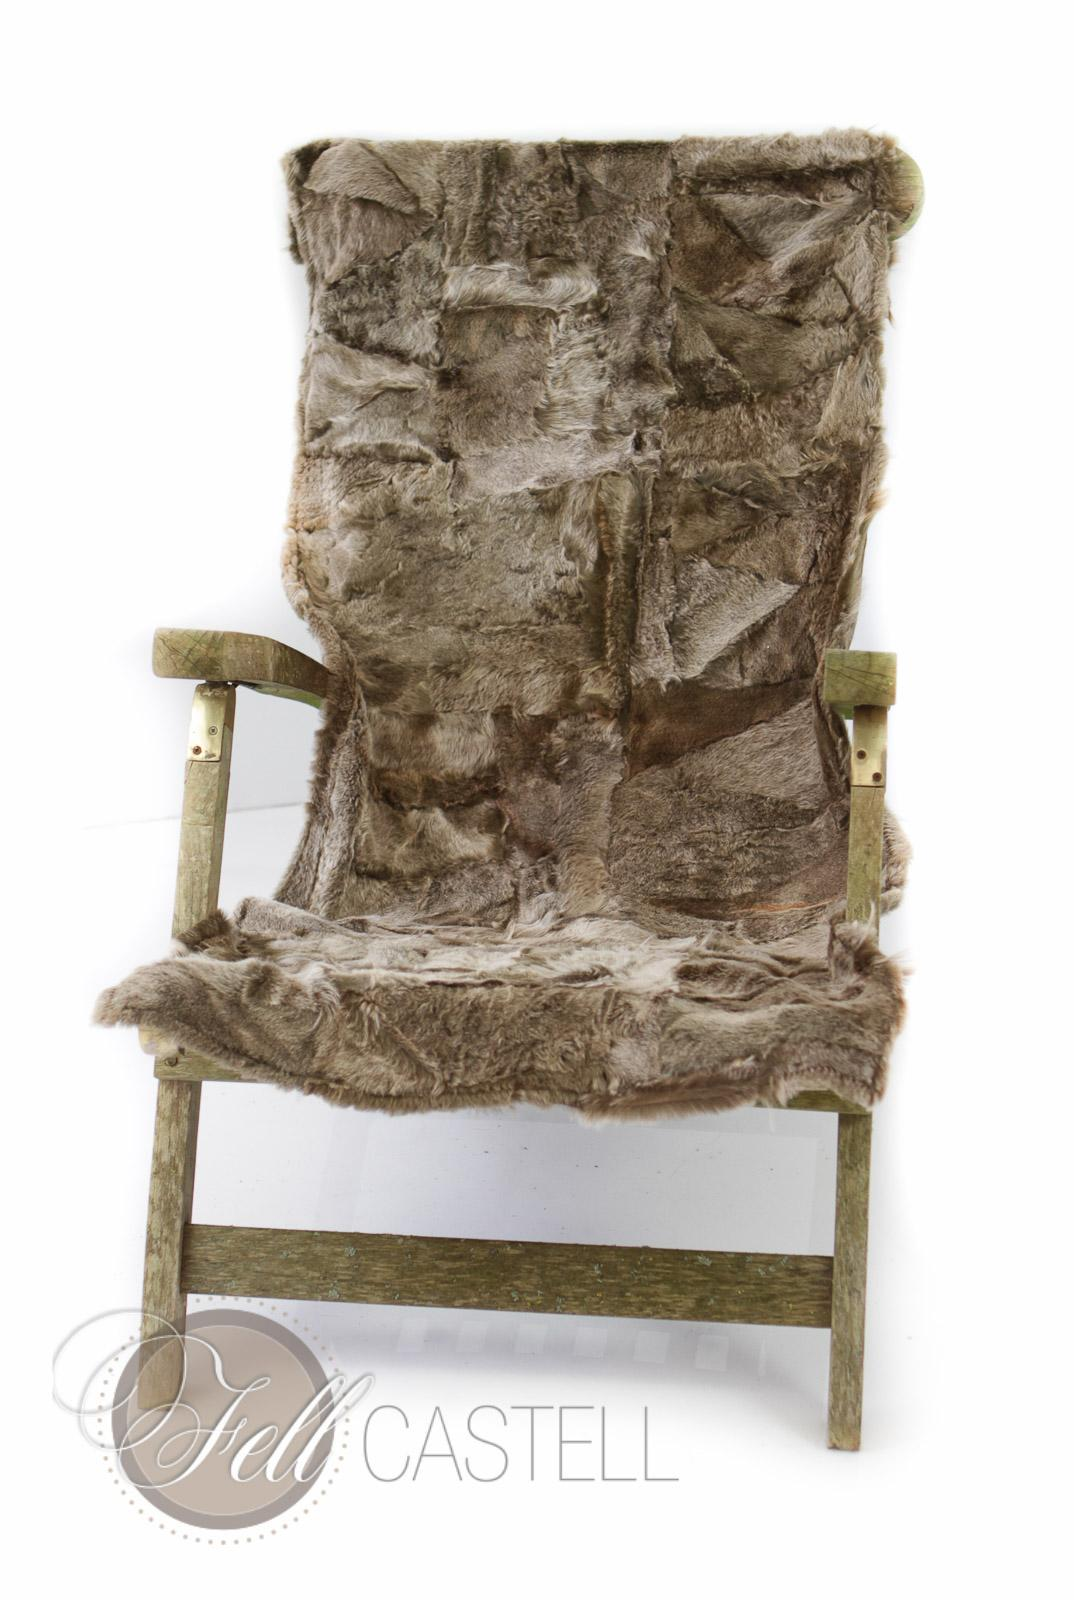 kleine lammfell decke 155x55 cm r ckseite leder taupe brisa lammfell schaffell shop. Black Bedroom Furniture Sets. Home Design Ideas